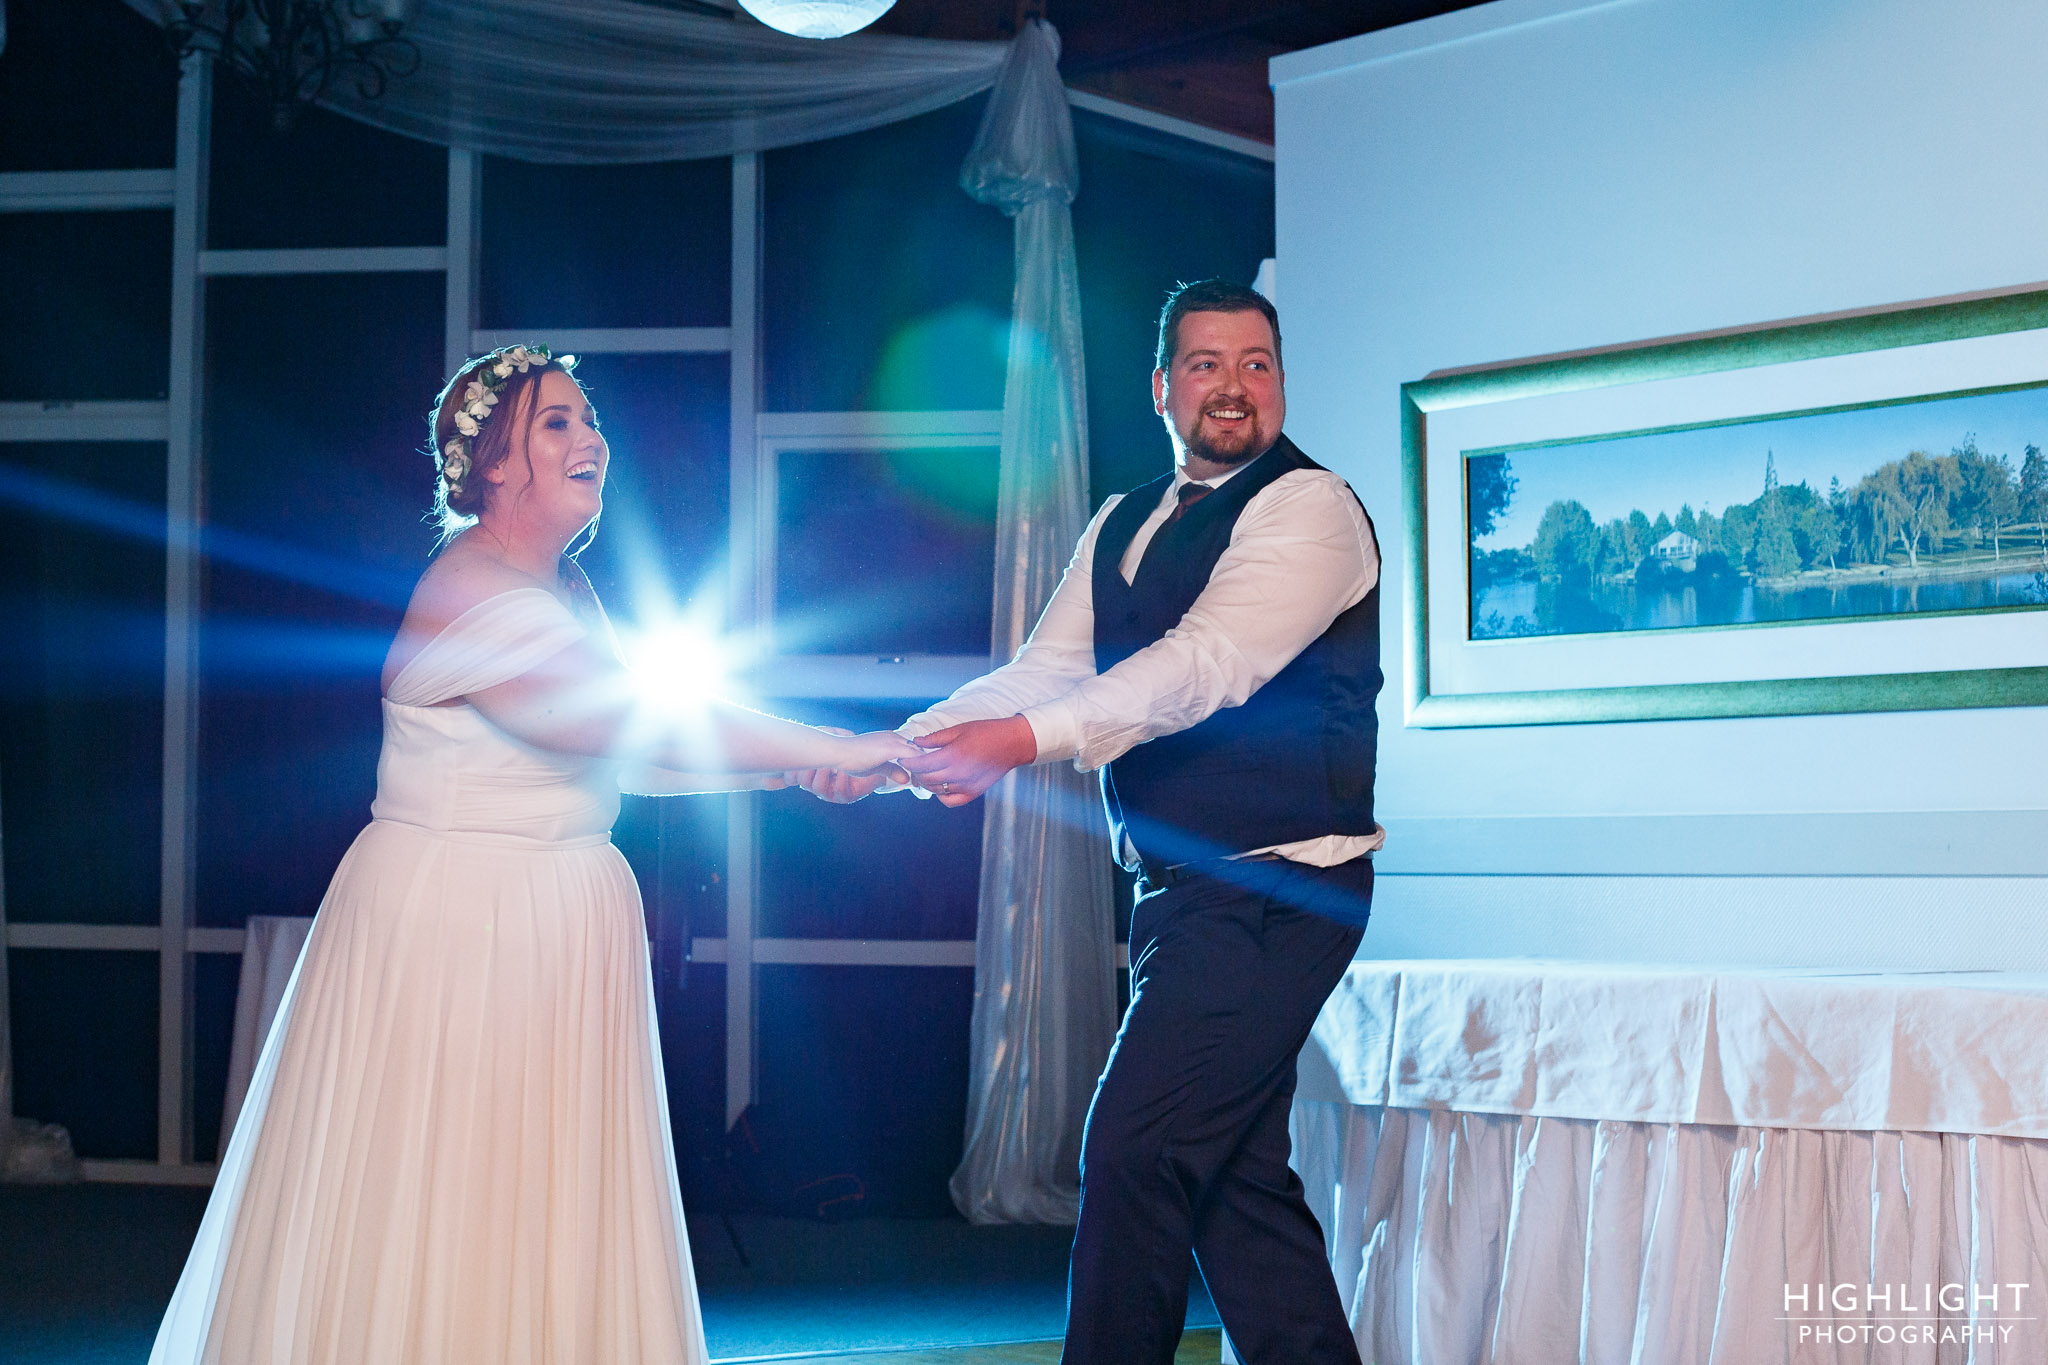 Highlight-wedding-photography-new-zealand-palmerston-north-134.jpg